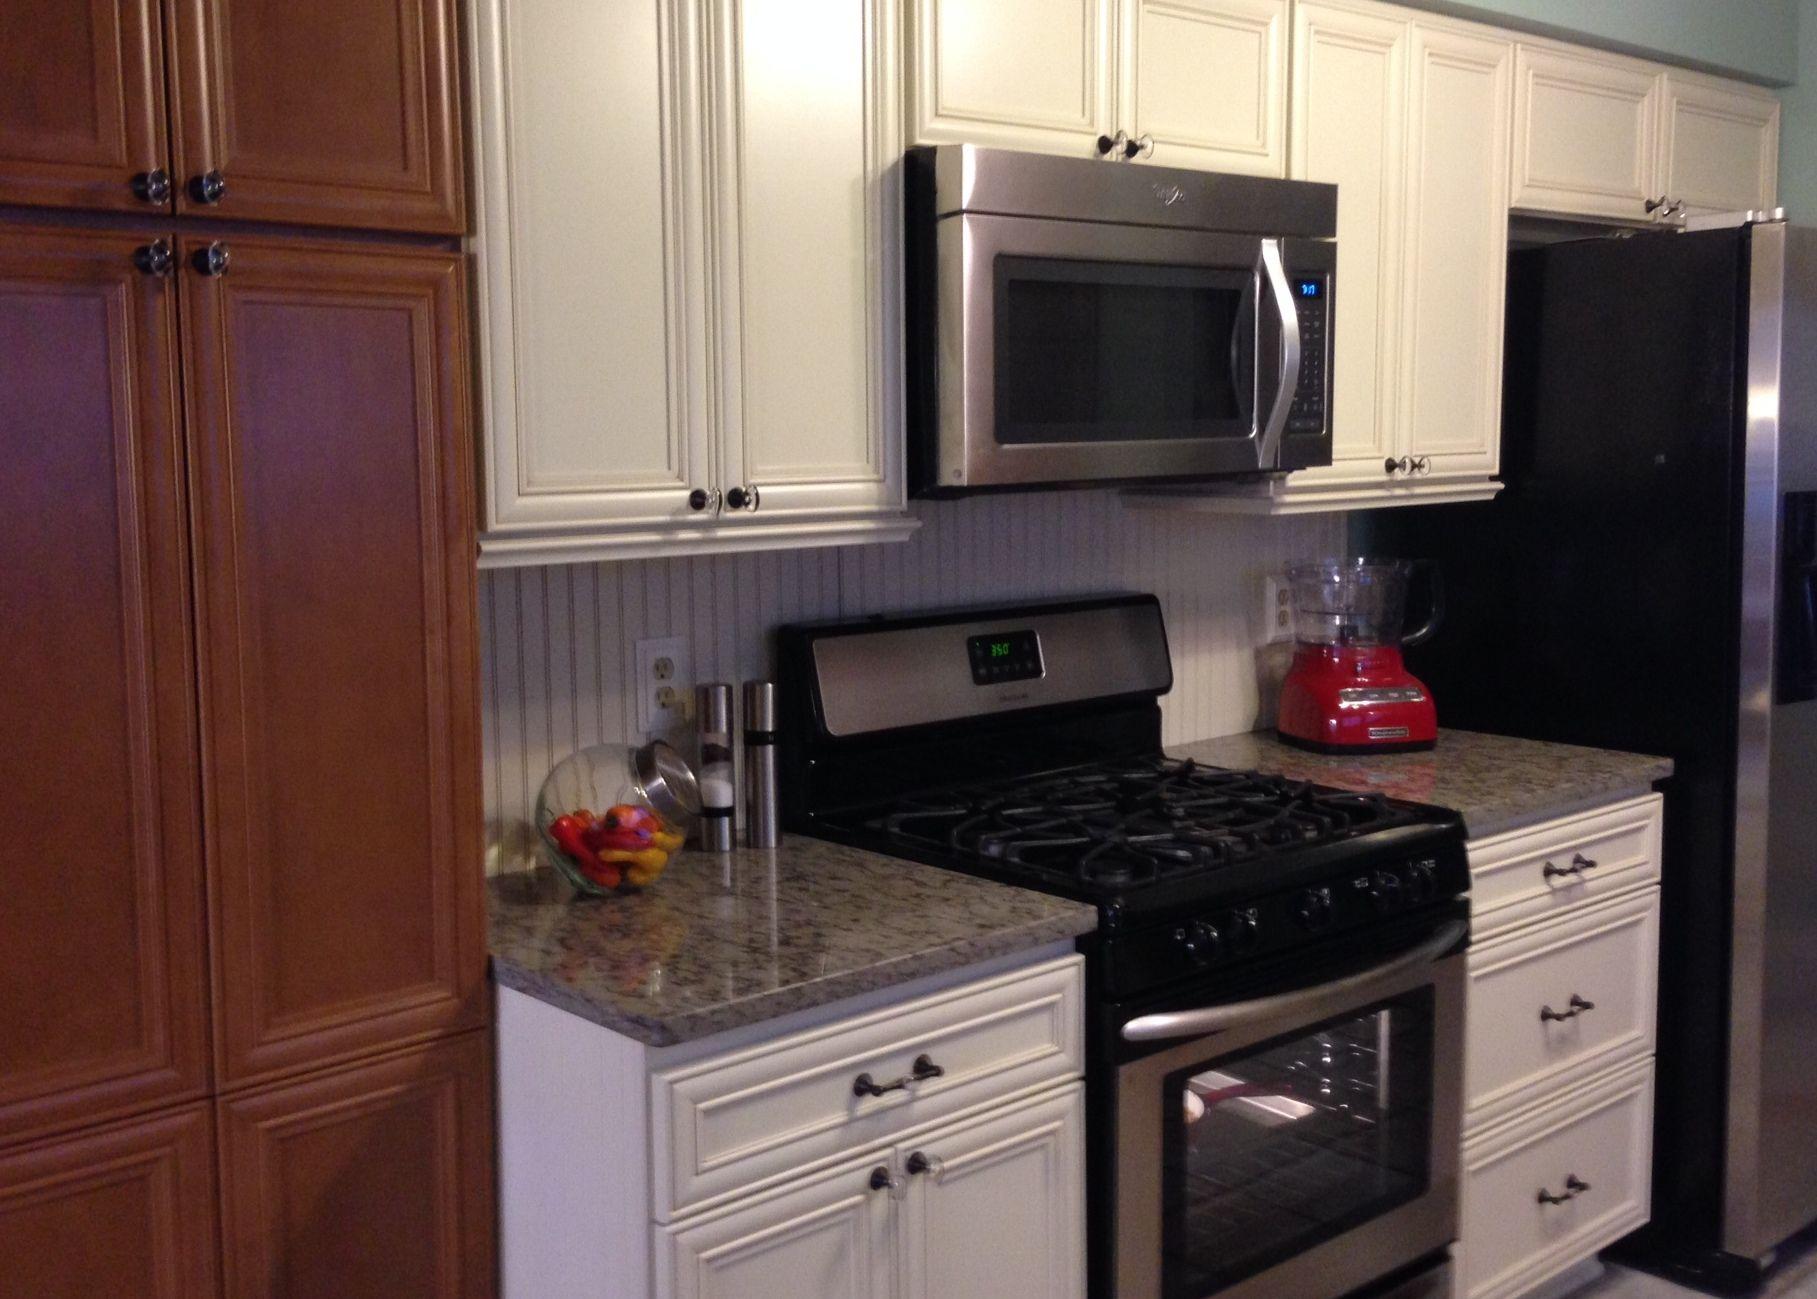 Remodeled Kitchen Cream Colored Cabinets Are Maple With Biscotti Base And Cocoa Glaze Darker Cabs Are Maple Wi Kitchen Remodel Cream Colored Cabinets Kitchen